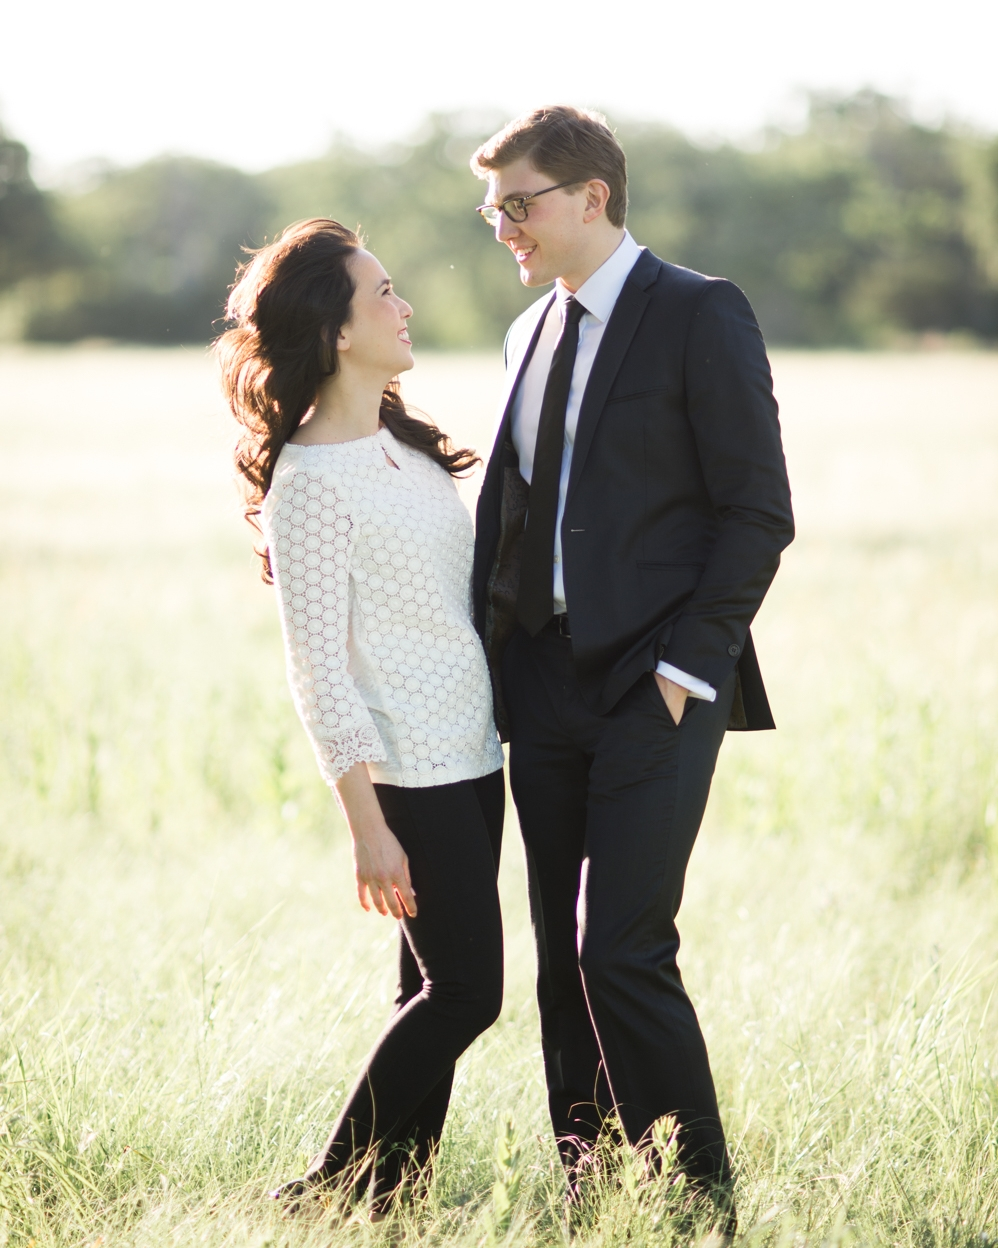 Sara & Patrick - AUSTIN TX- ENGAGEMENT